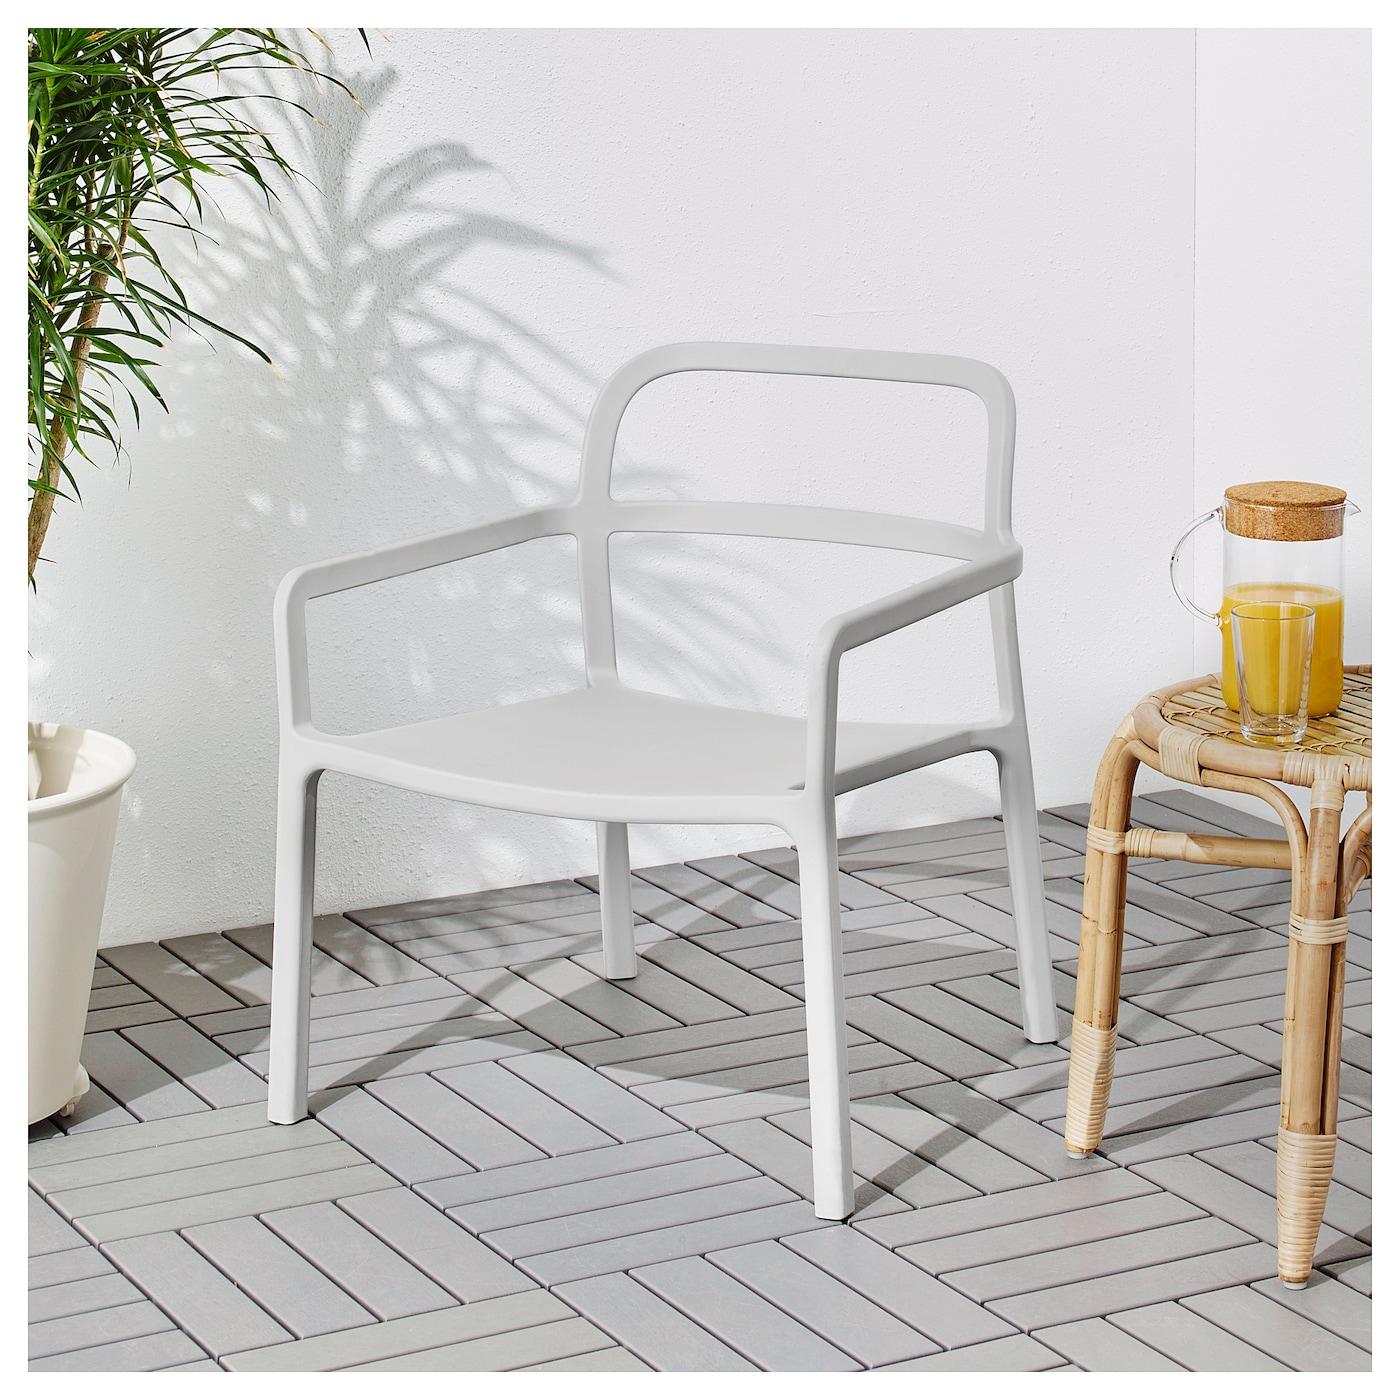 ypperlig fauteuil int ext rieur gris clair ikea. Black Bedroom Furniture Sets. Home Design Ideas